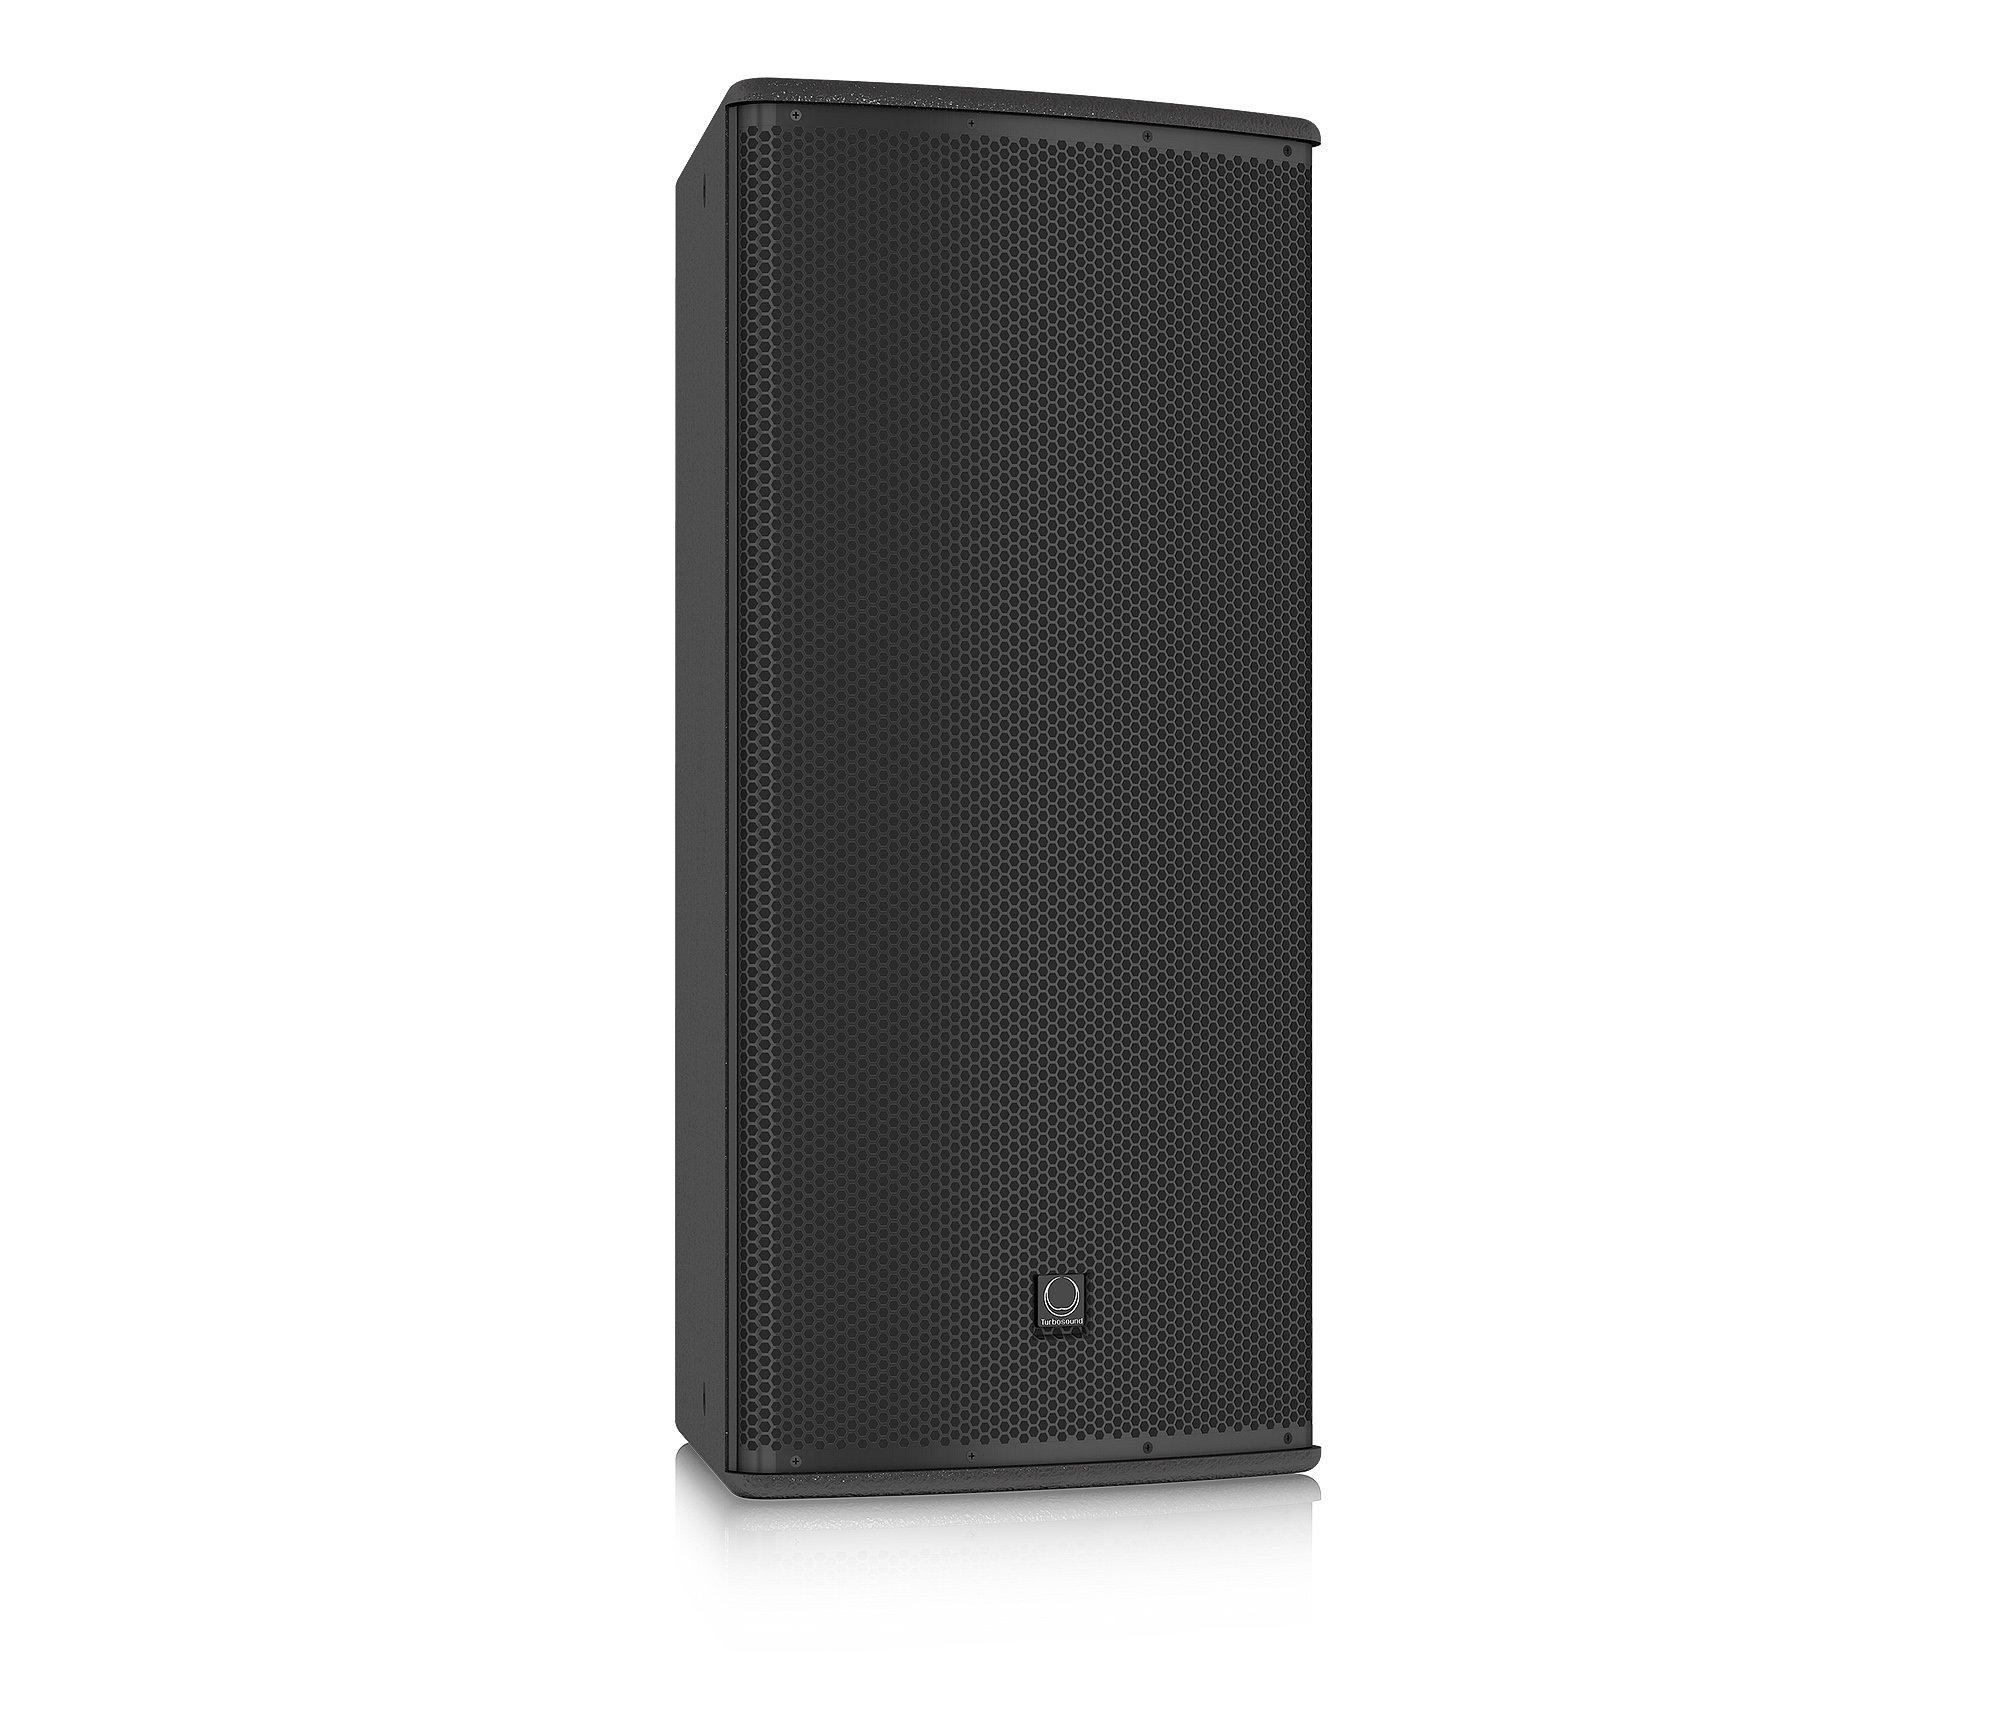 "12"" 600W (8 Ohms) 2-Way Full-Range Passive/Bi-Amp Loudspeaker with 60°x40° Dispersion in Black"